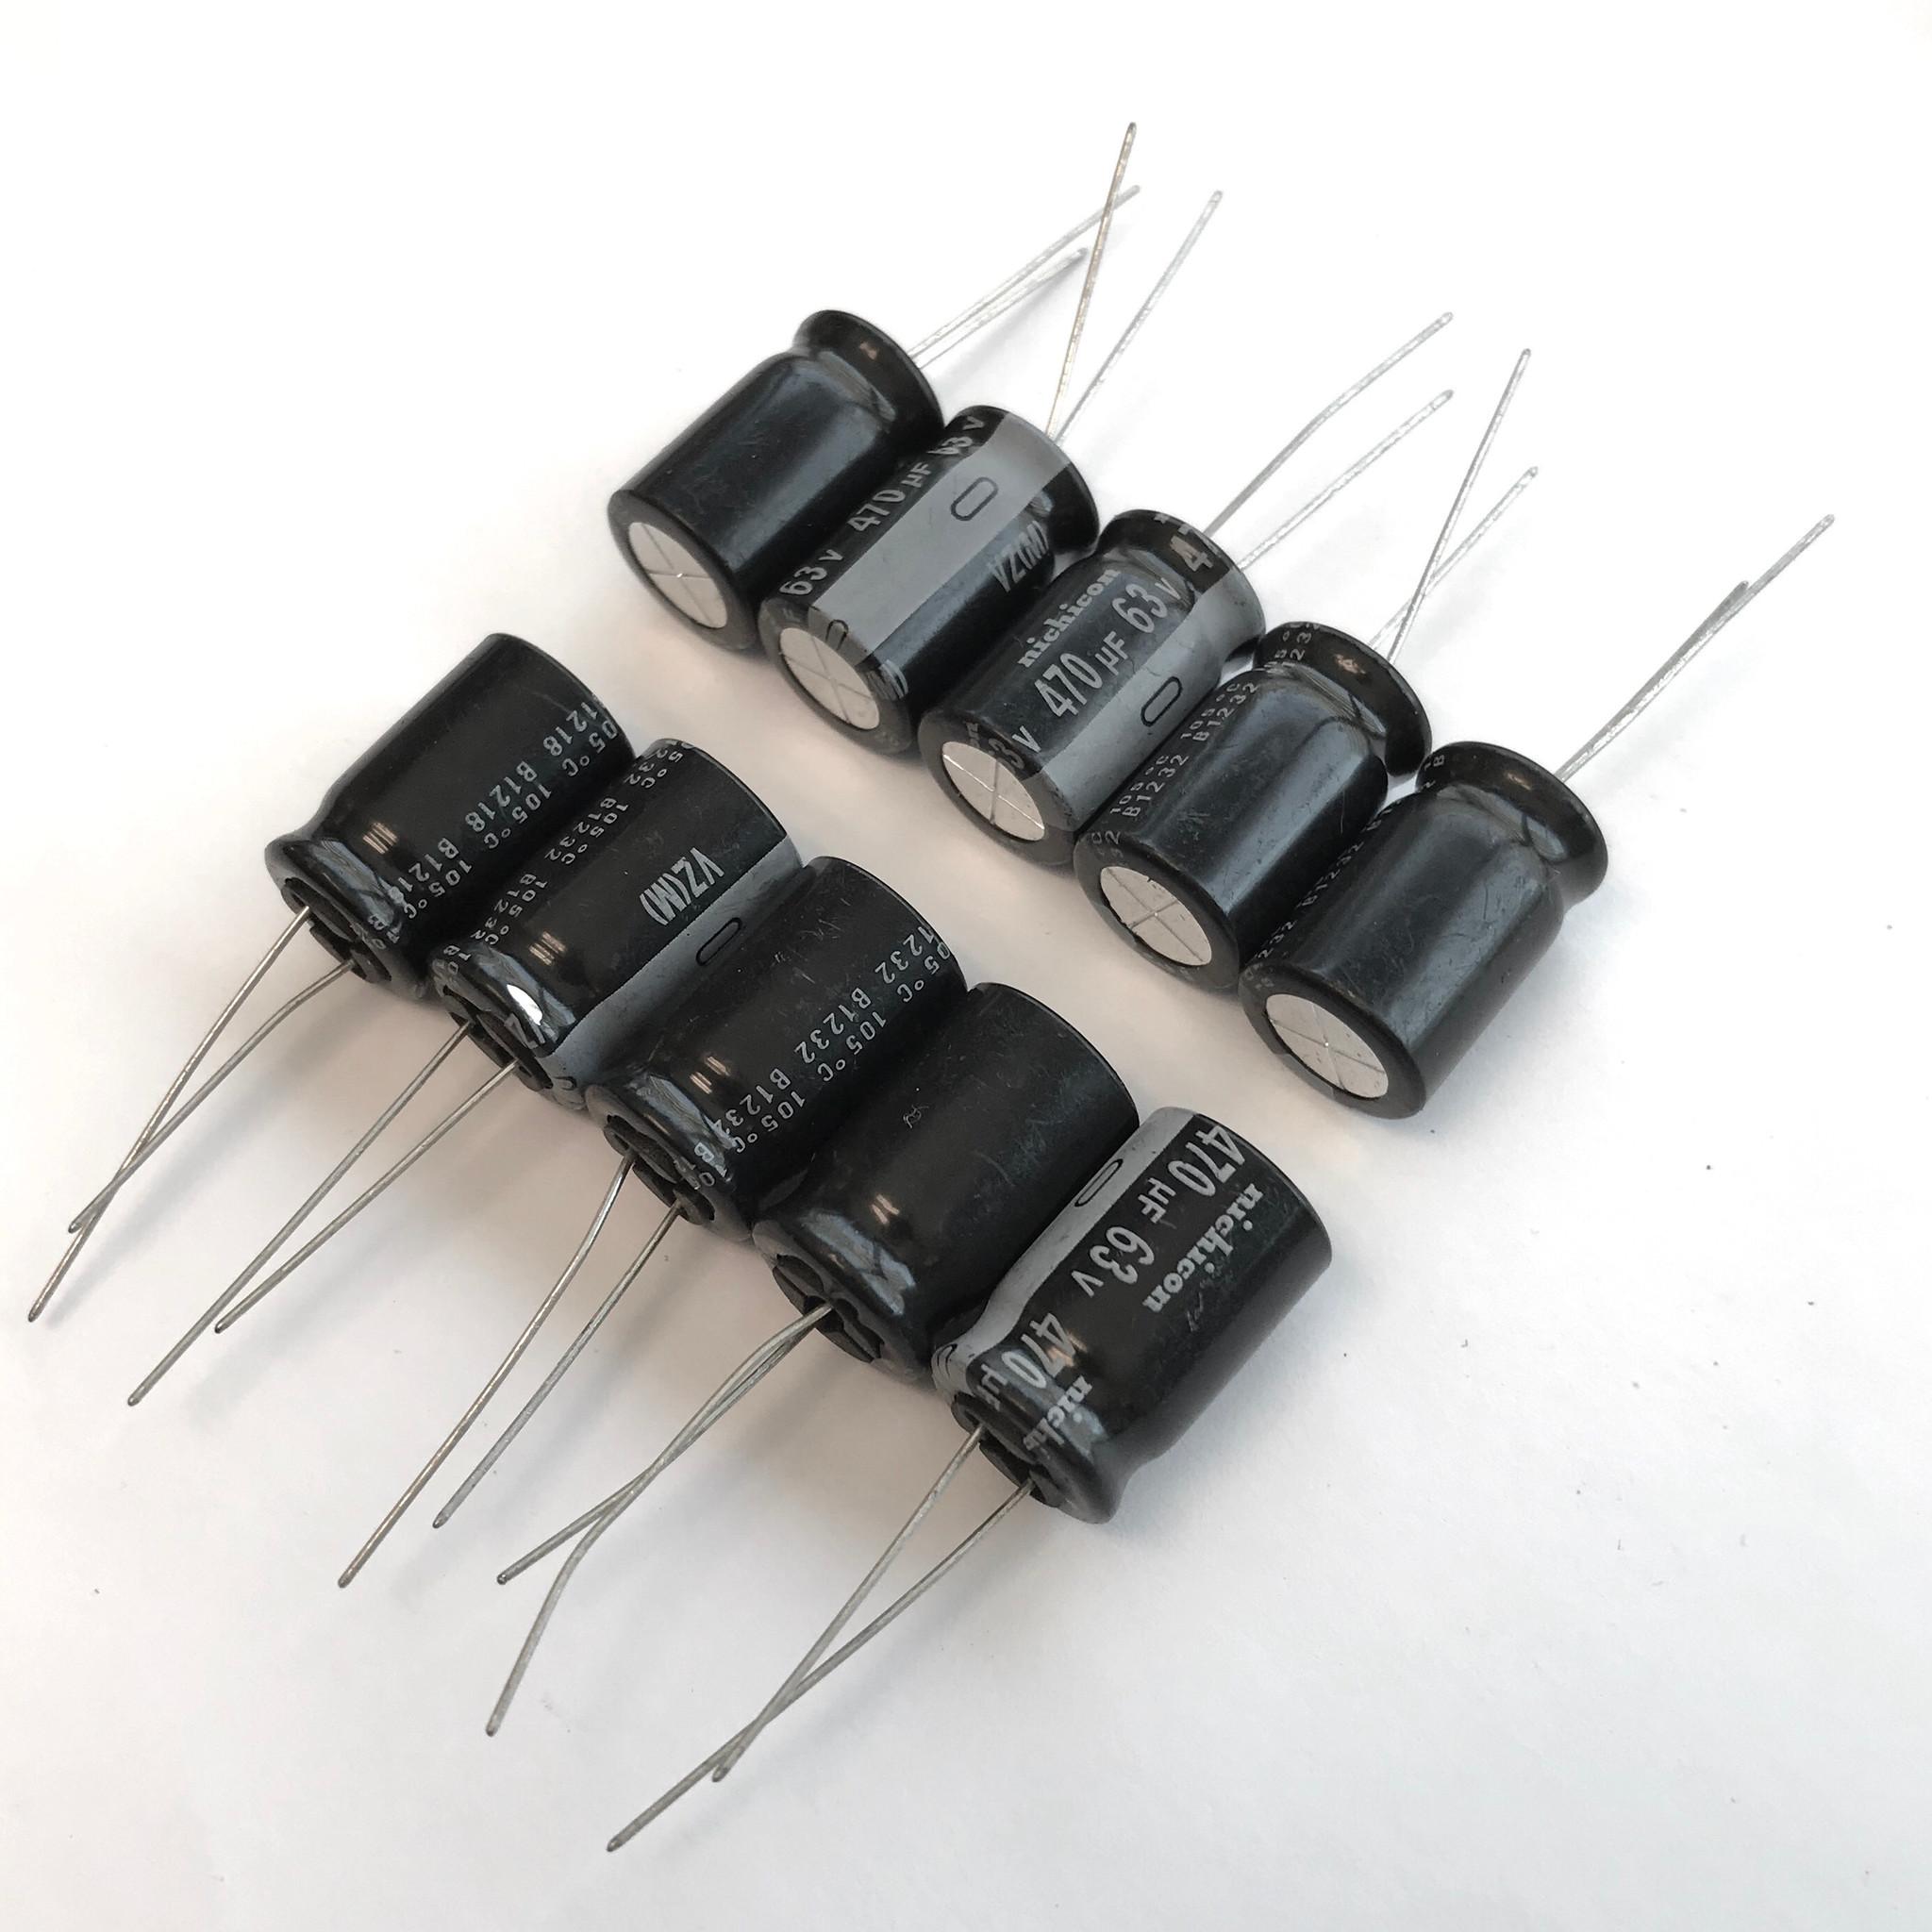 Radial 105ºC 470uF 35V Electrolytic Capacitor PKG of 10 UCC LXZ Series